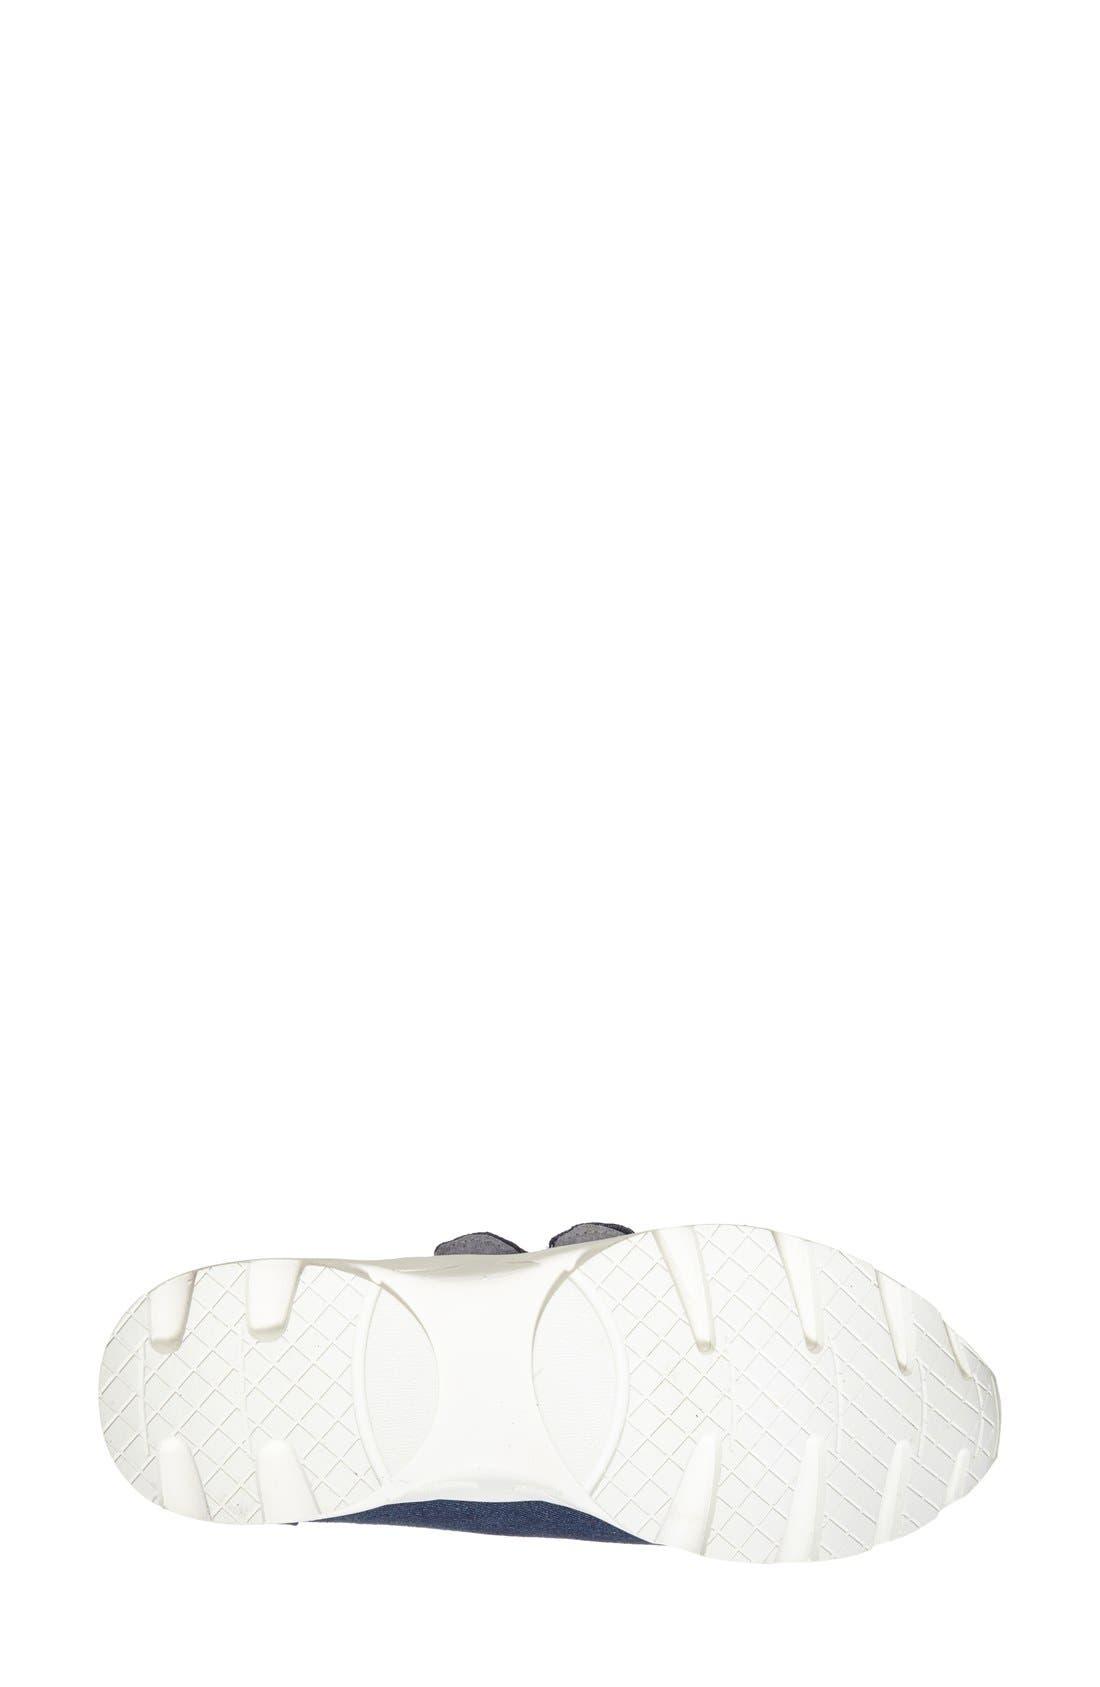 'Lucille 2' Open Top Sneaker,                             Alternate thumbnail 3, color,                             487